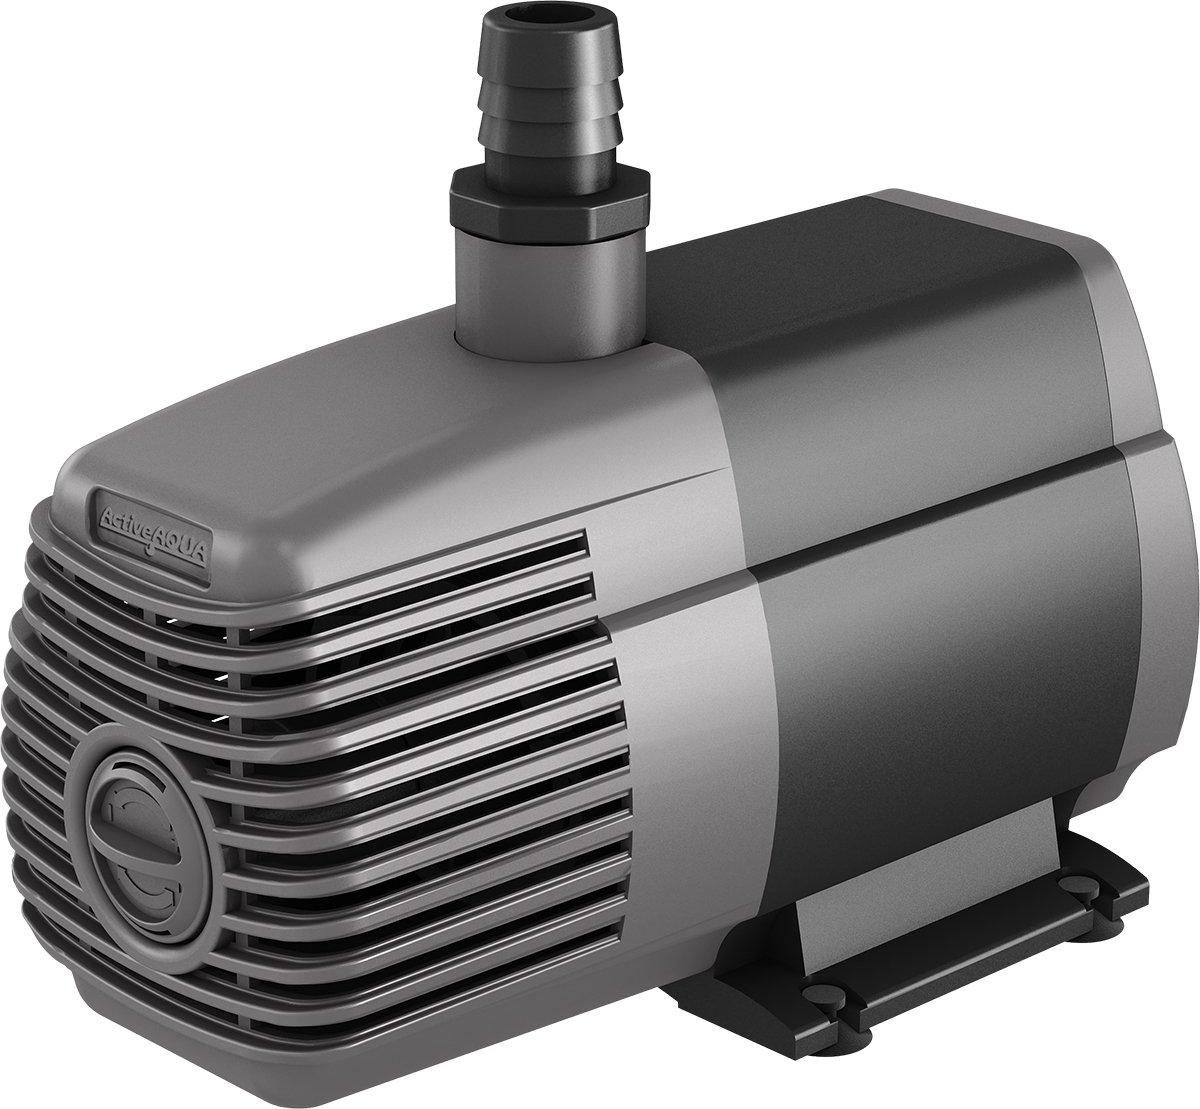 Active Aqua Submersible Water Pump, 1110 GPH by Hydrofarm